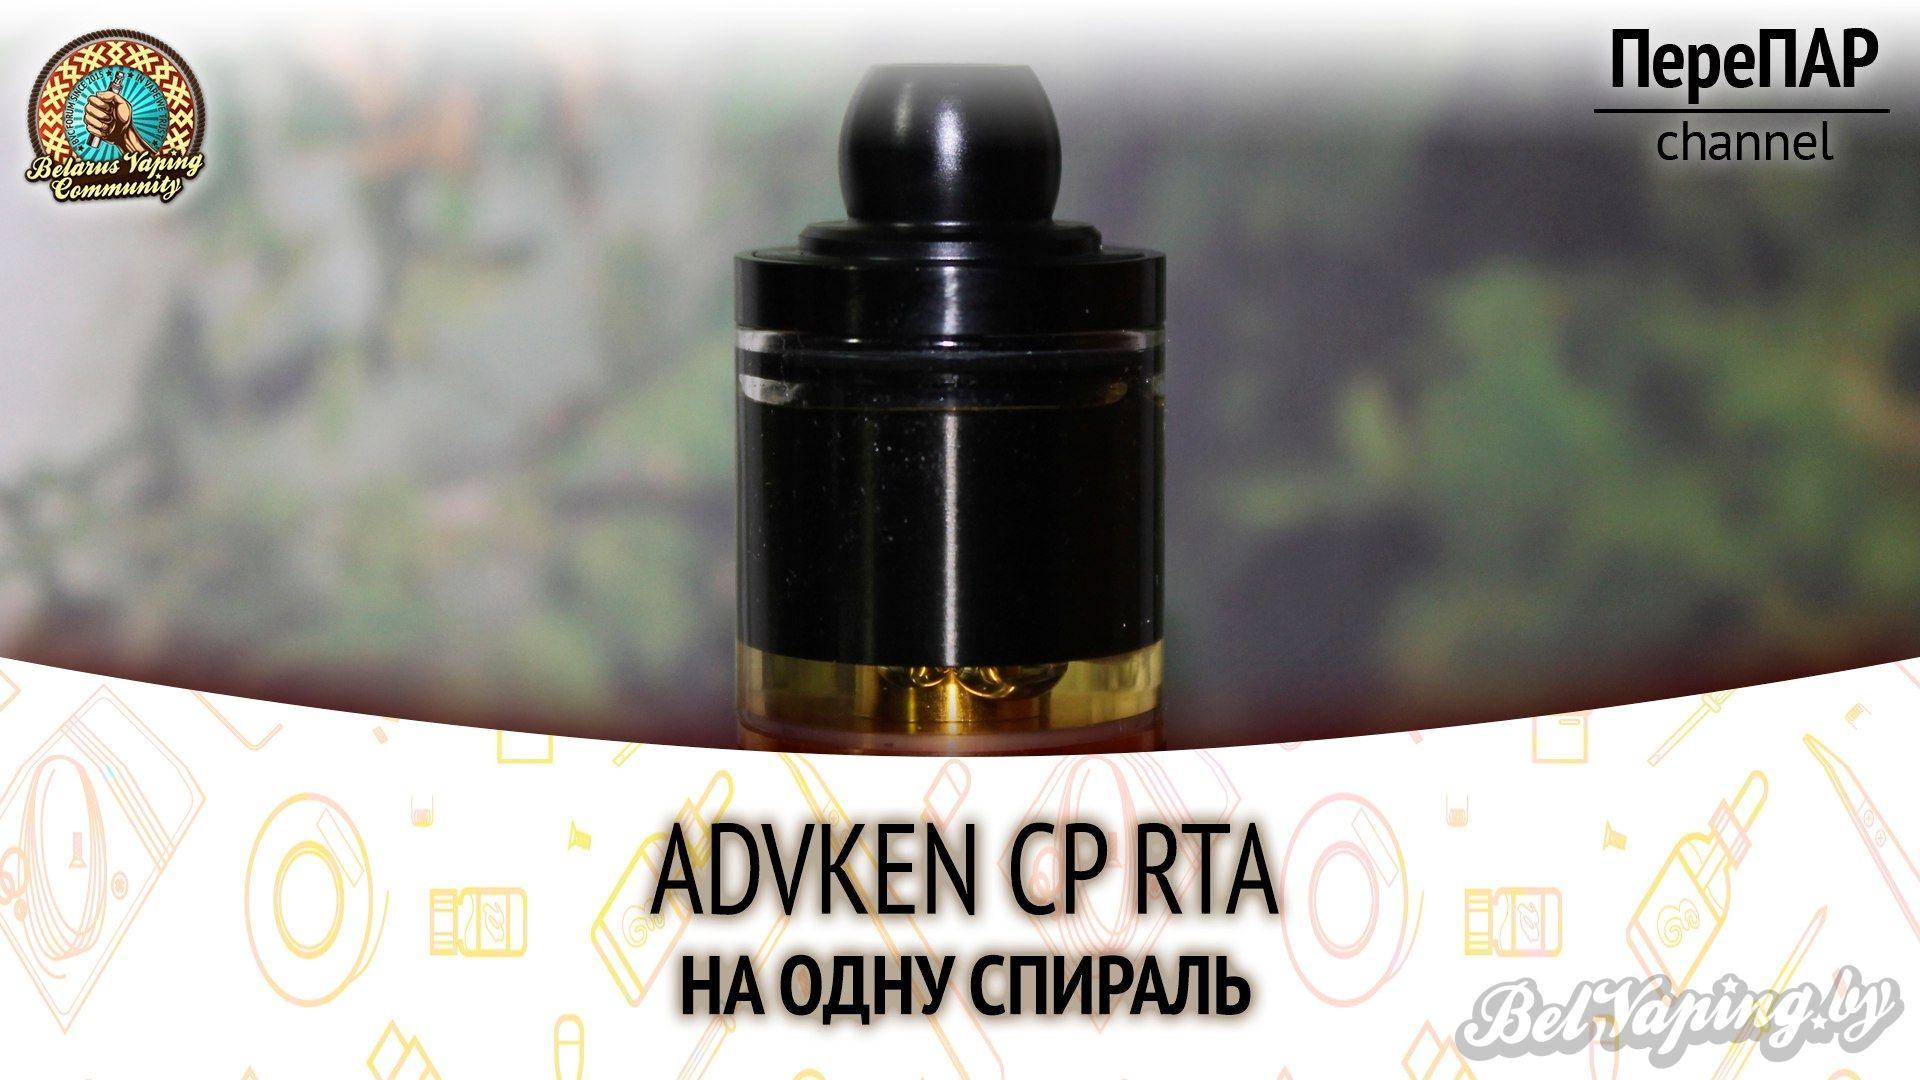 Обзор Advken CP RTA